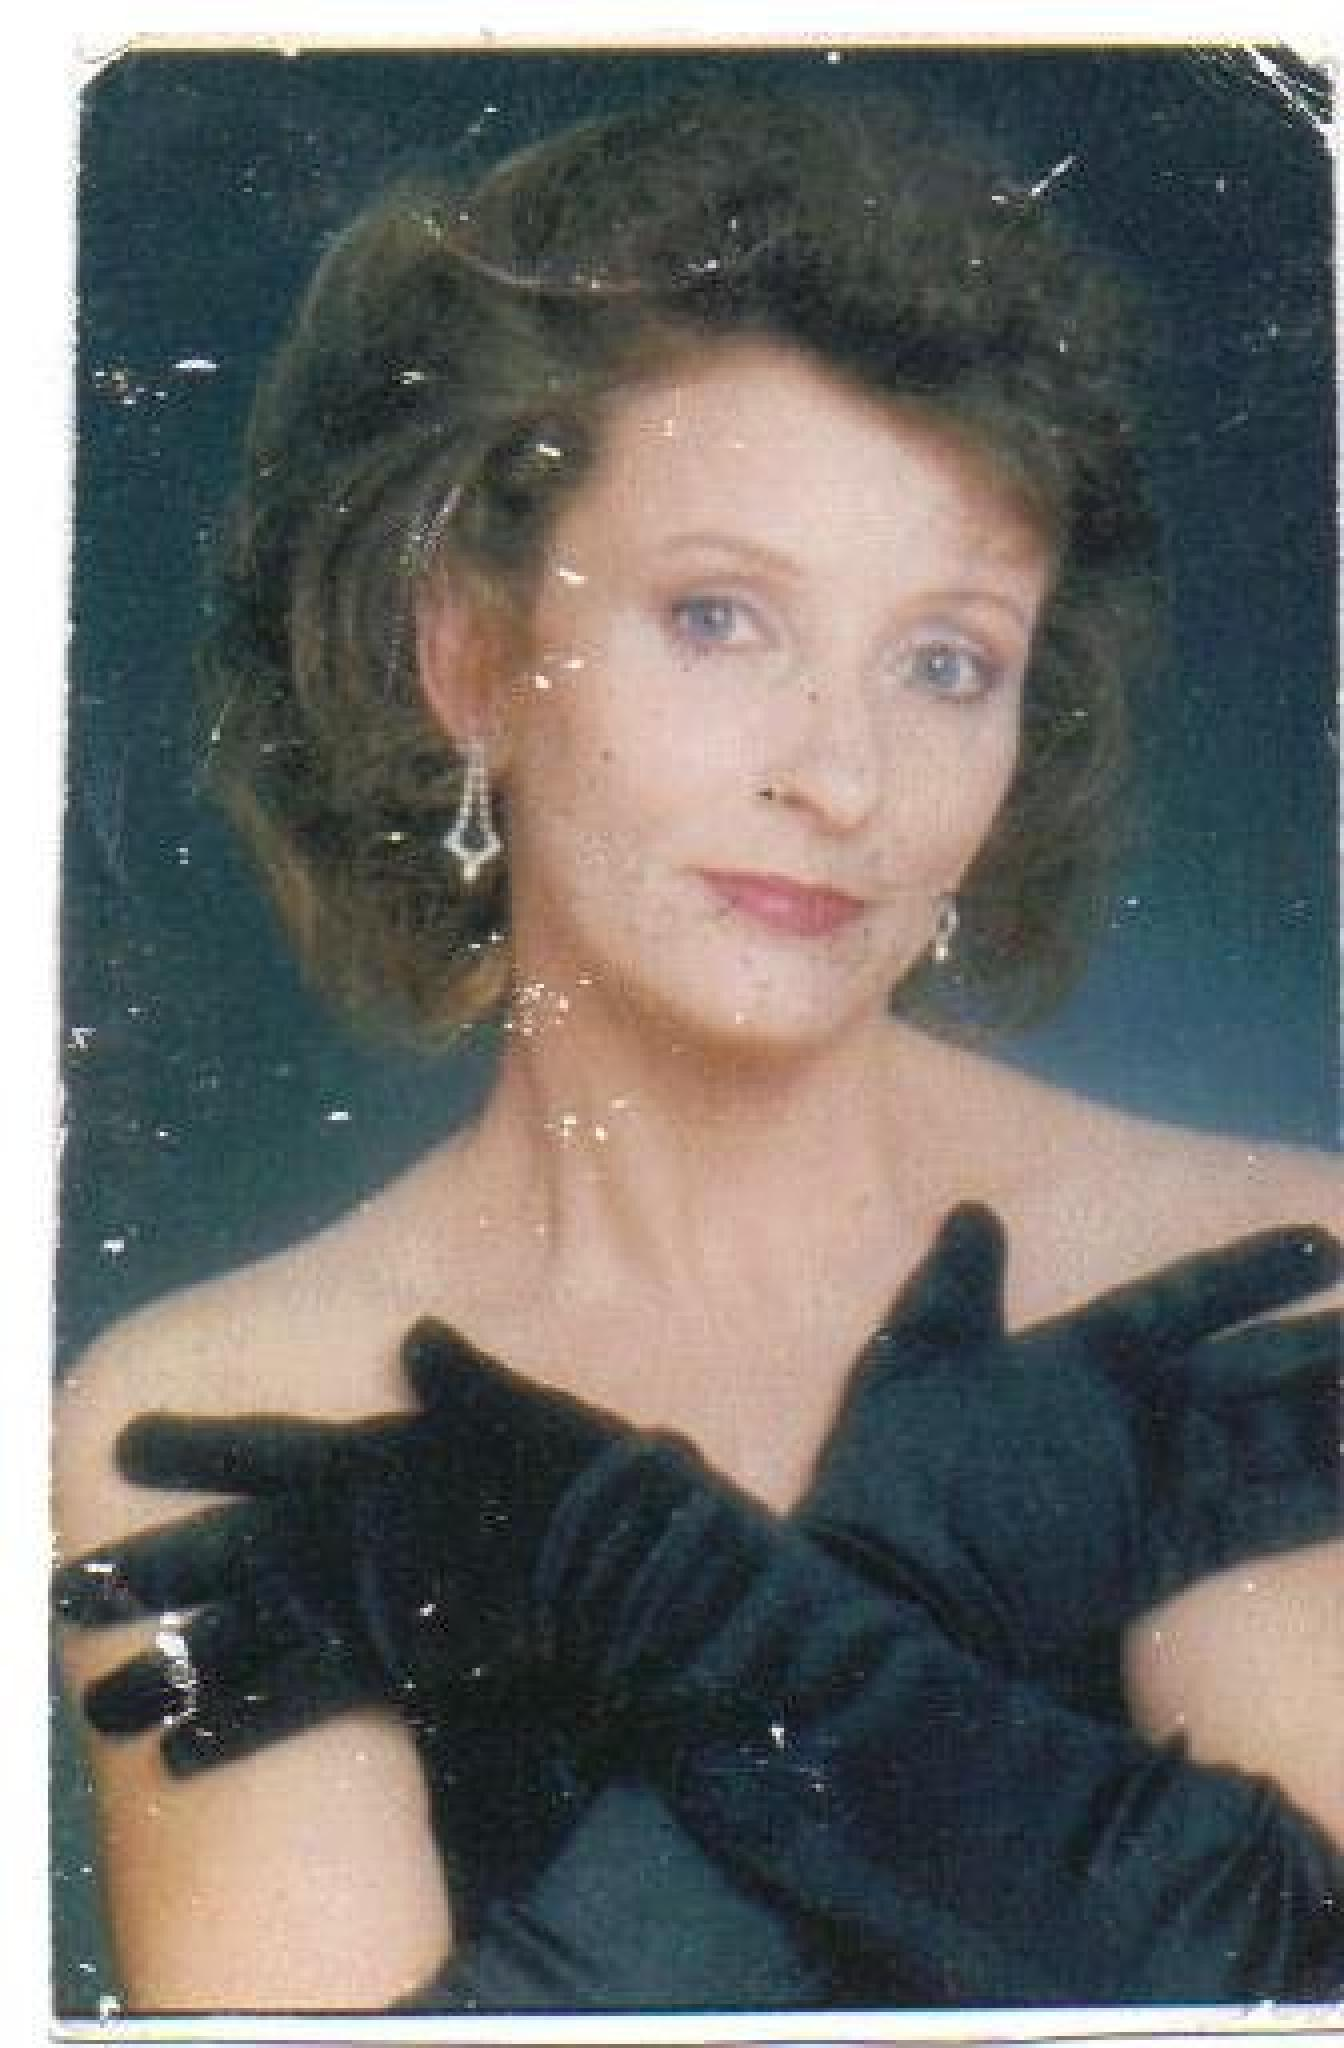 Ms. Keri by Keri E. Carter